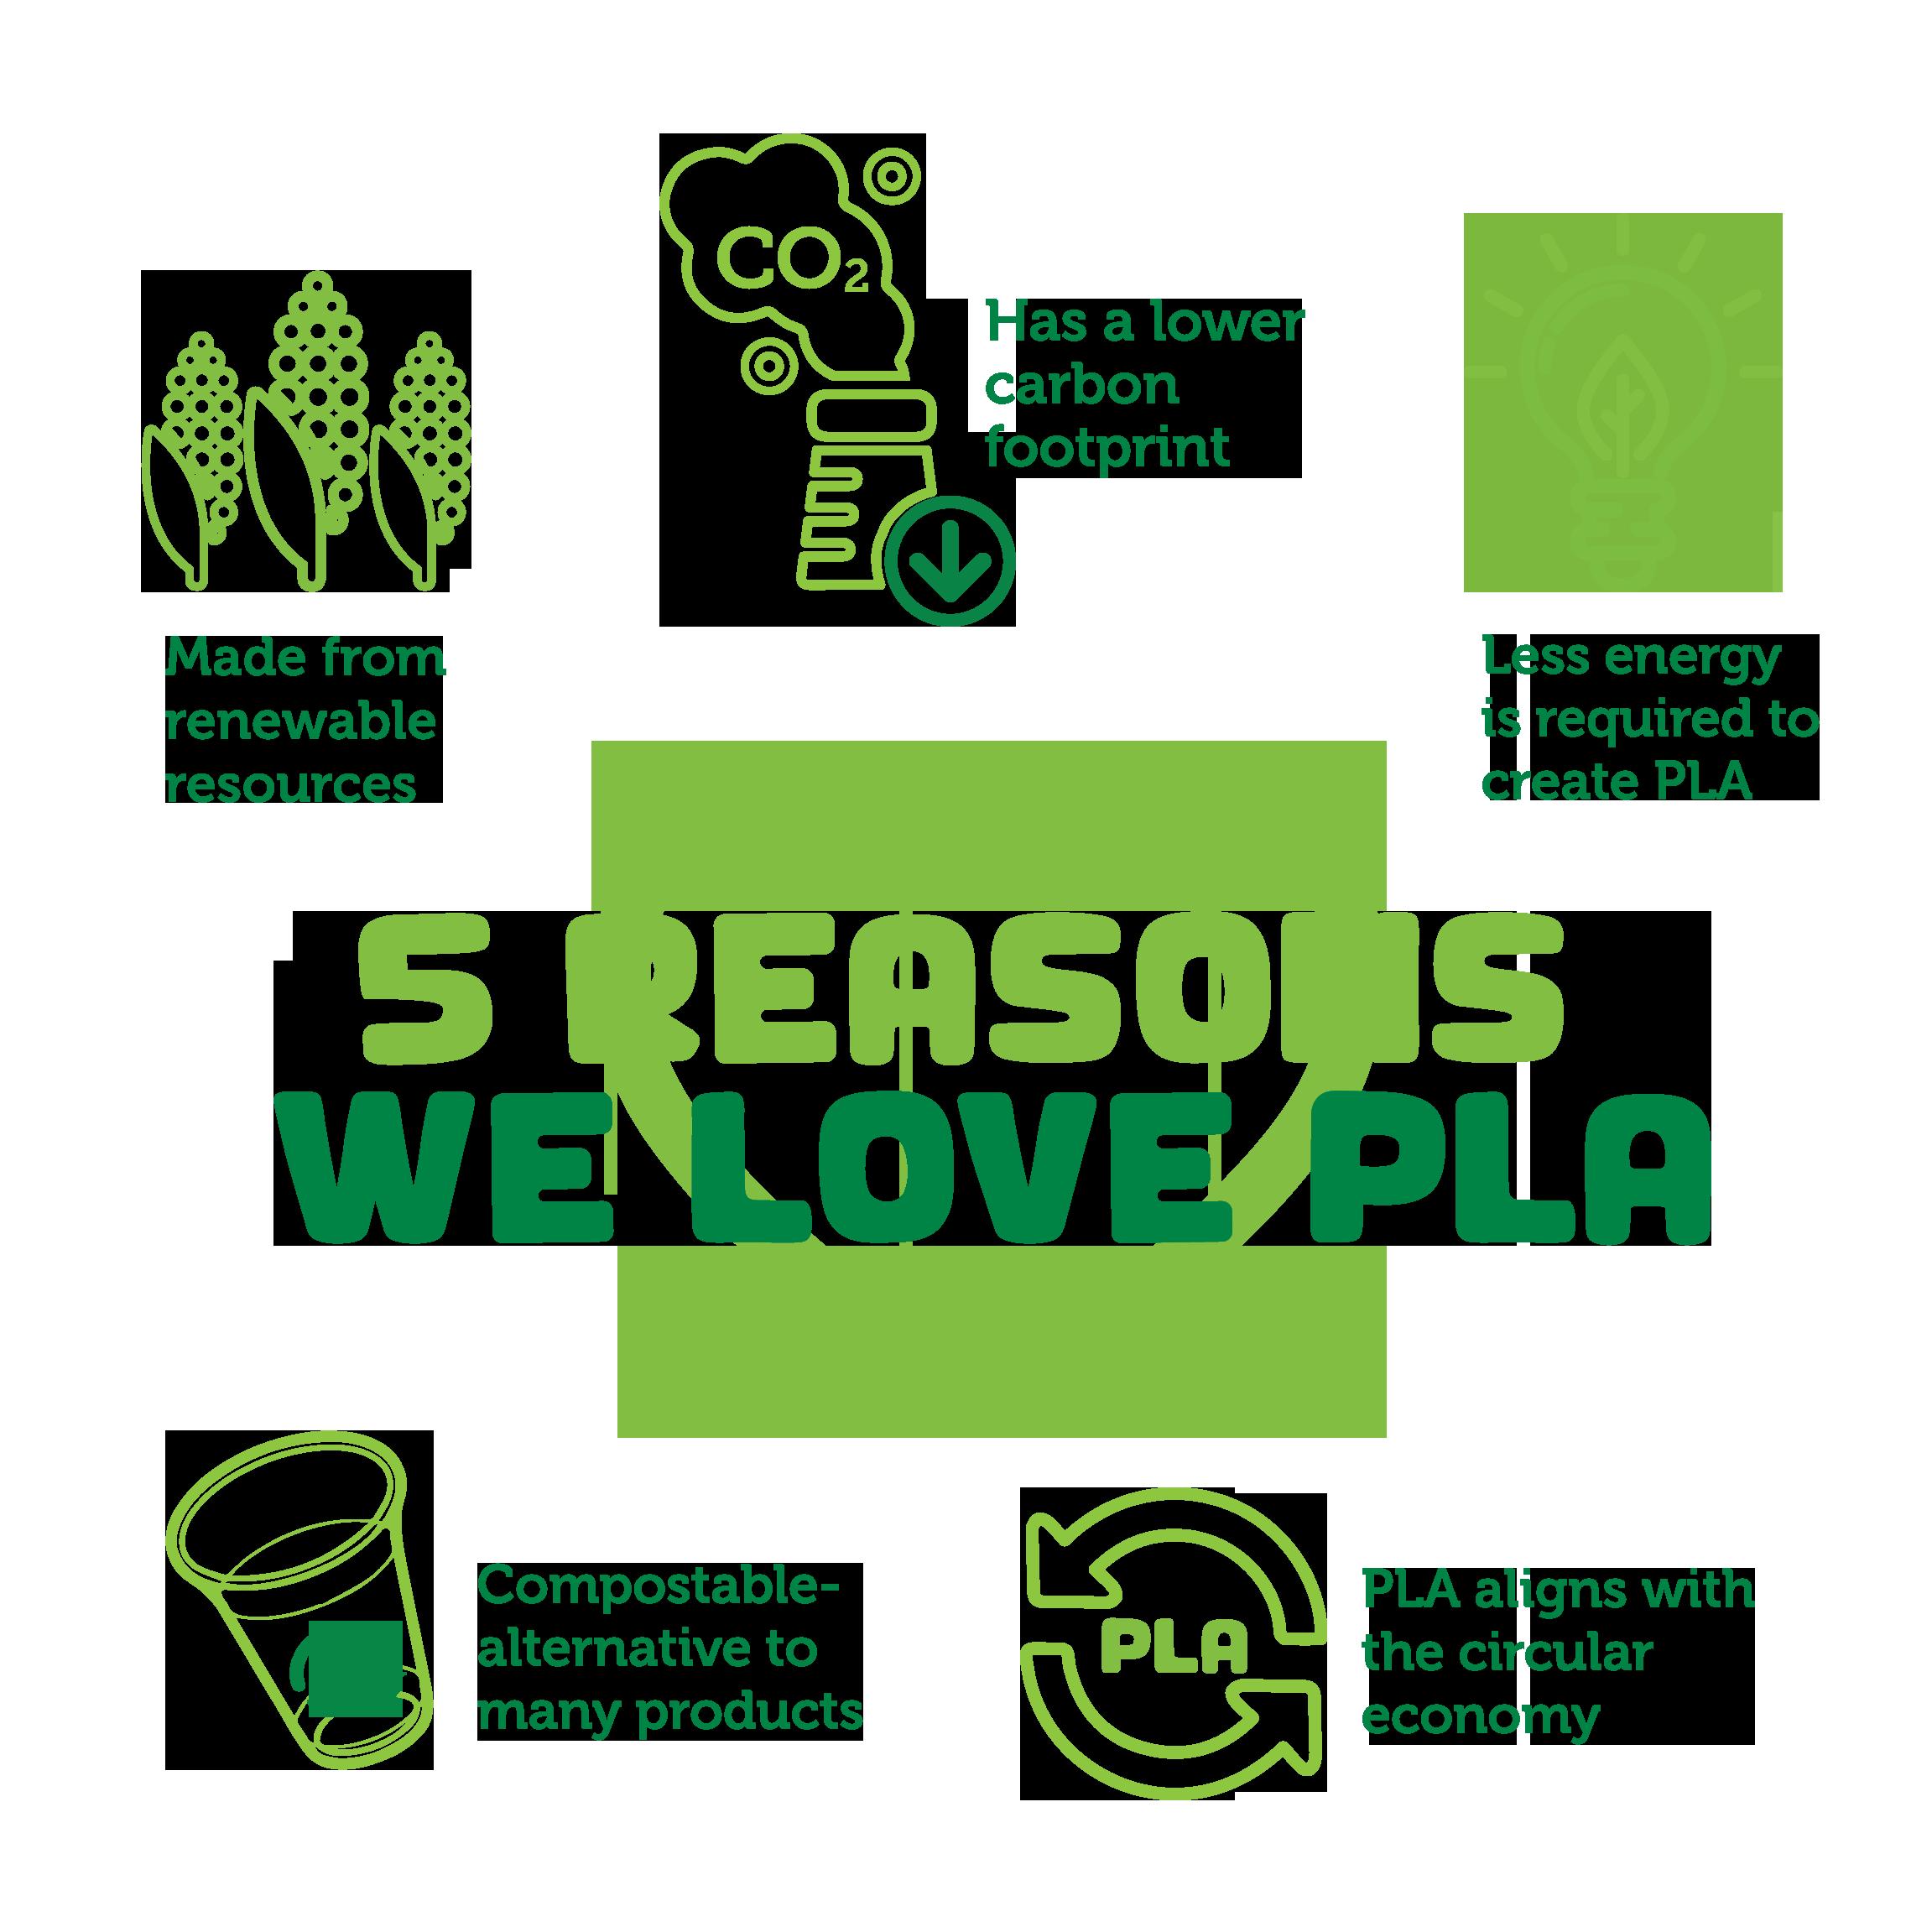 bioplastic pla benefits